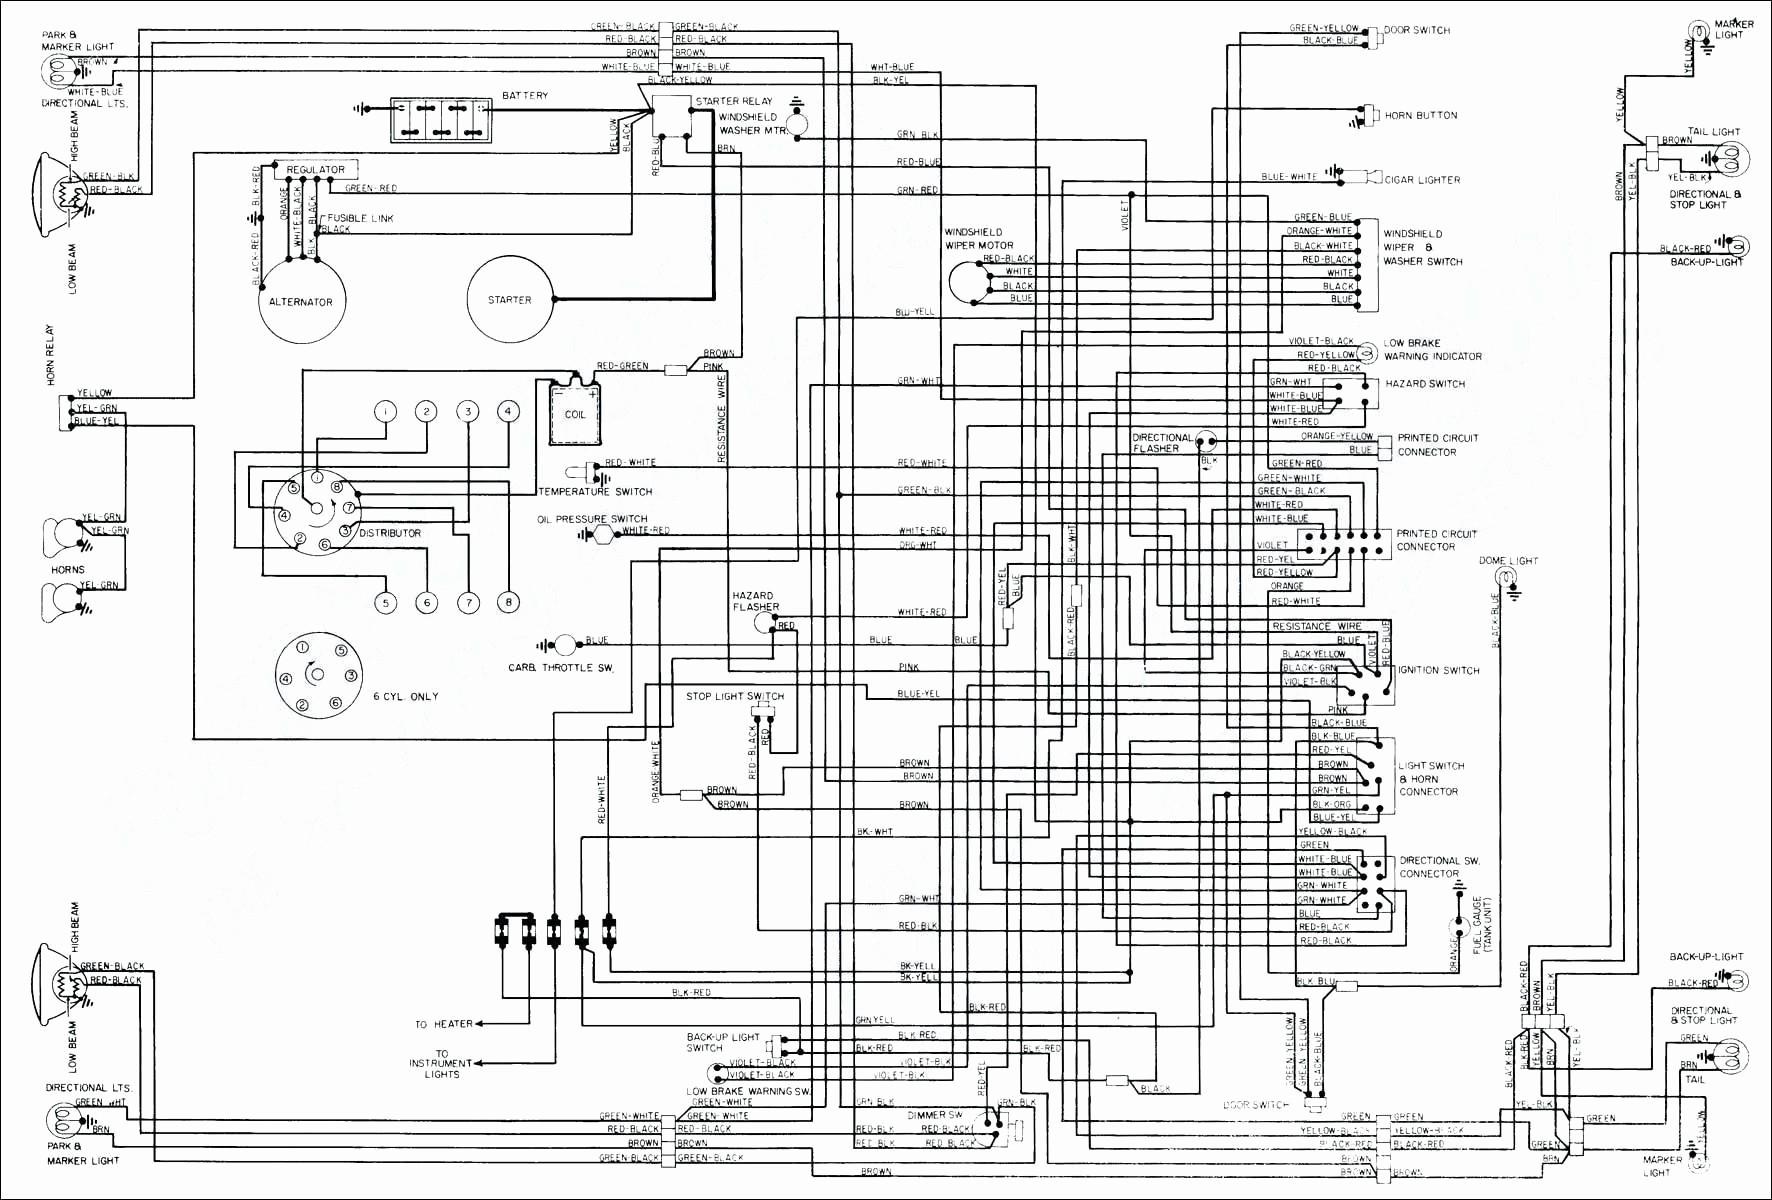 1996 ford Explorer Engine Diagram ford Explorer Wiring Harness Diagram Detailed Schematics Diagram Of 1996 ford Explorer Engine Diagram